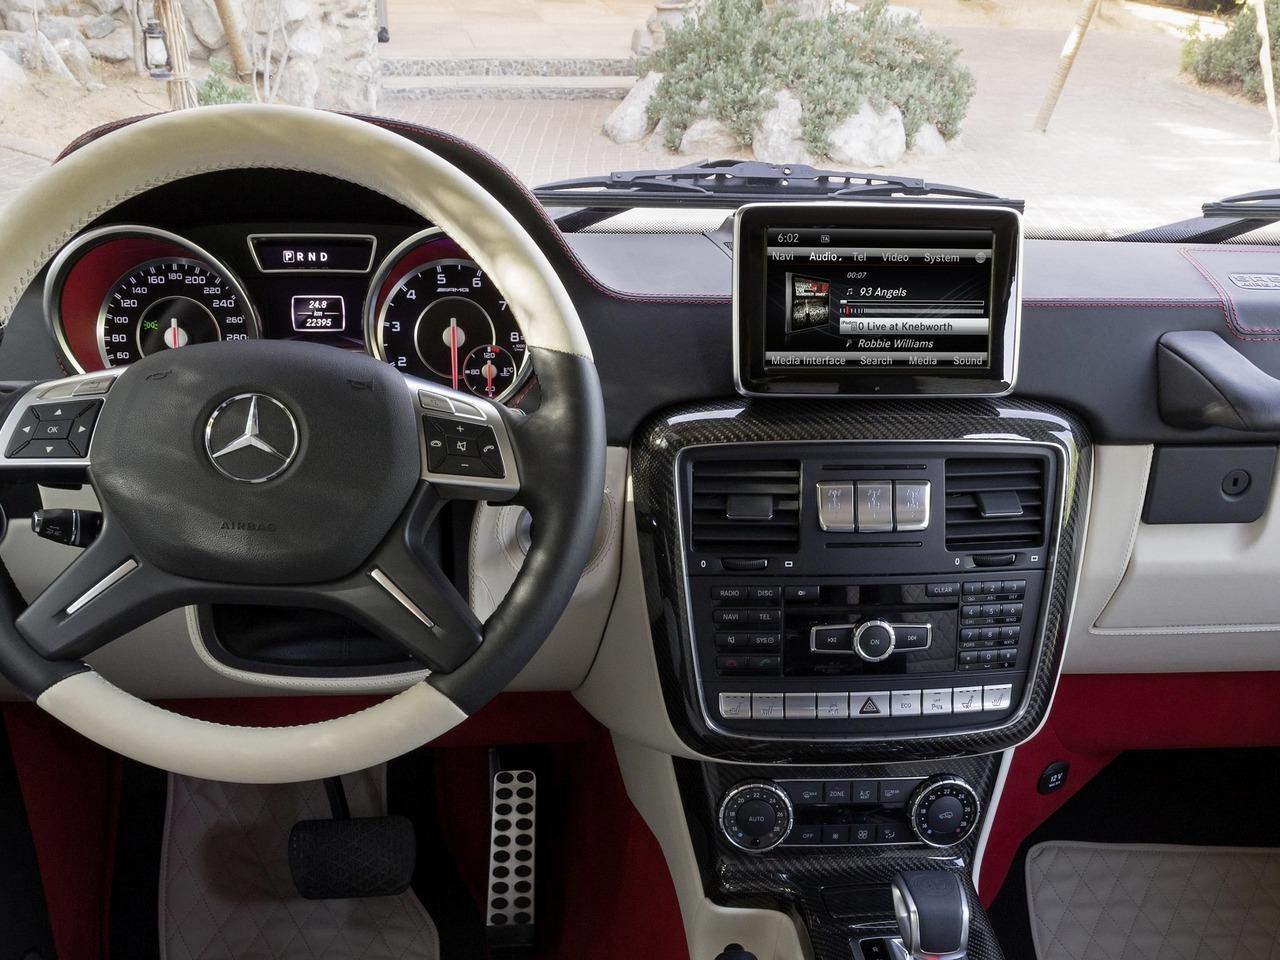 Снимки: Mercedes-benz G-klasse 6x6